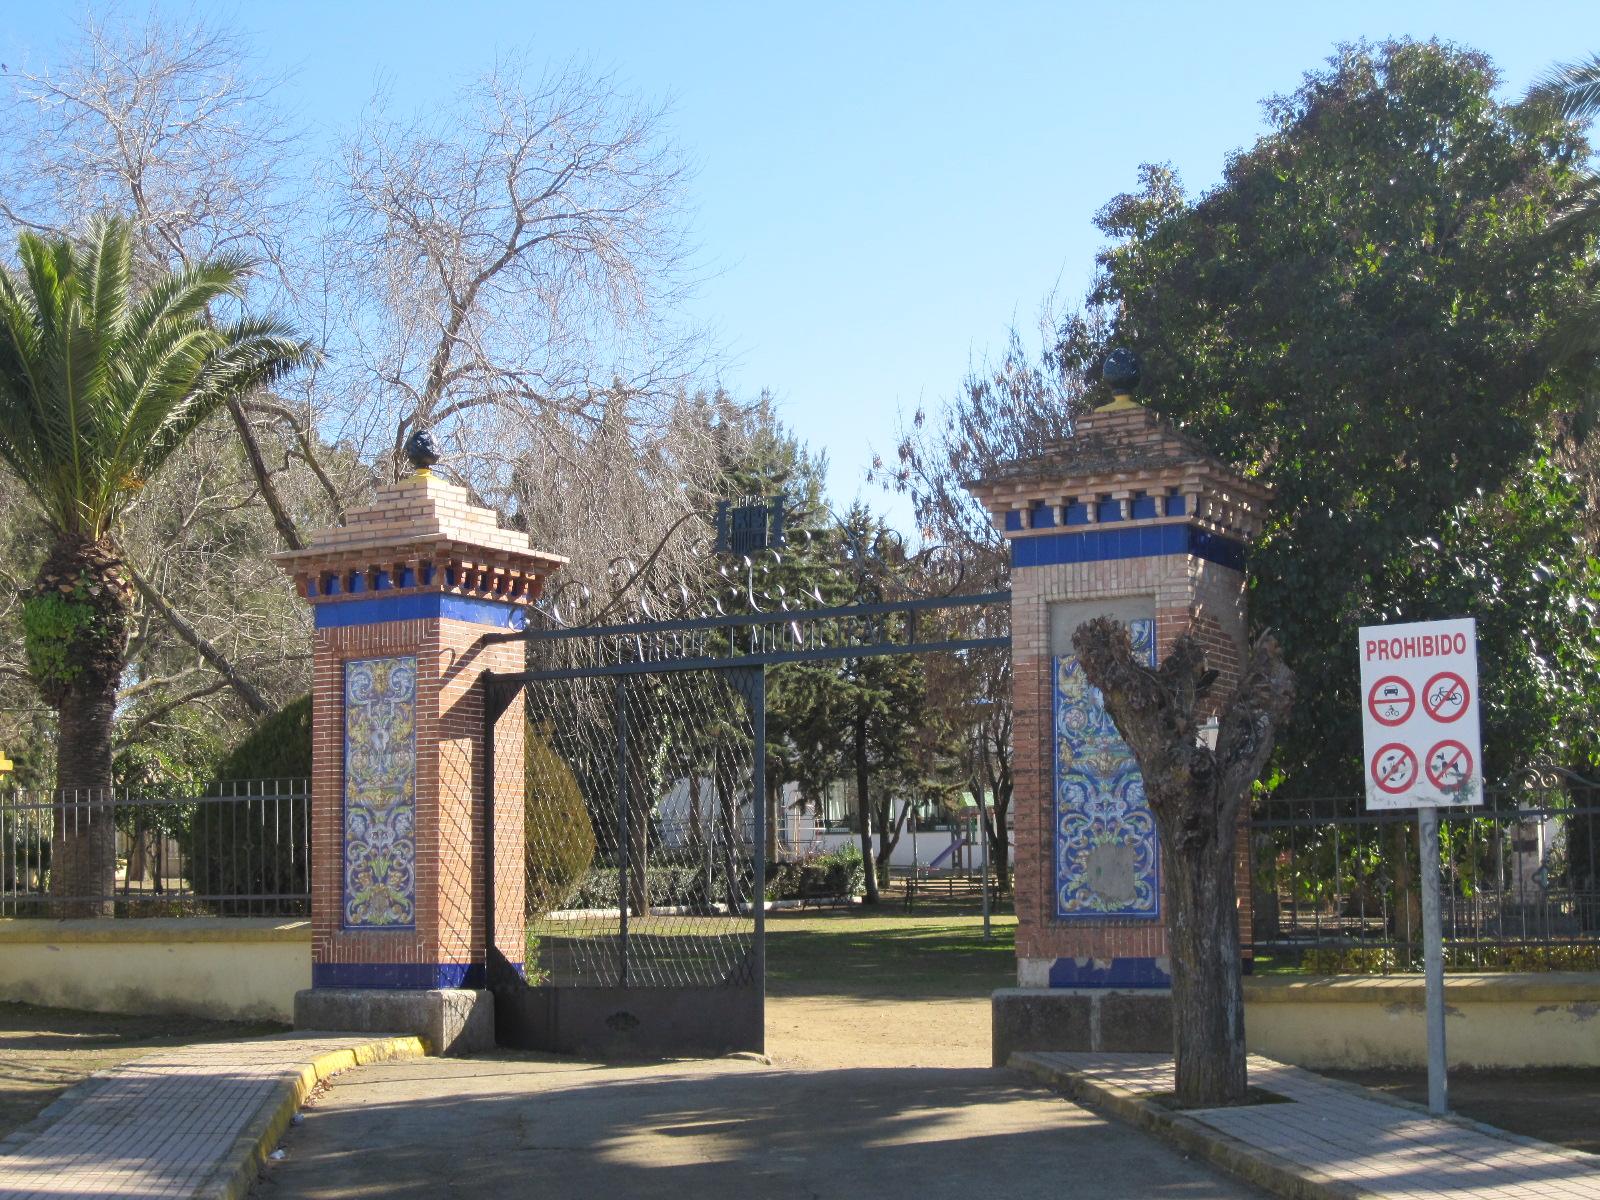 Parque Municipal Granja de Torrehermosa